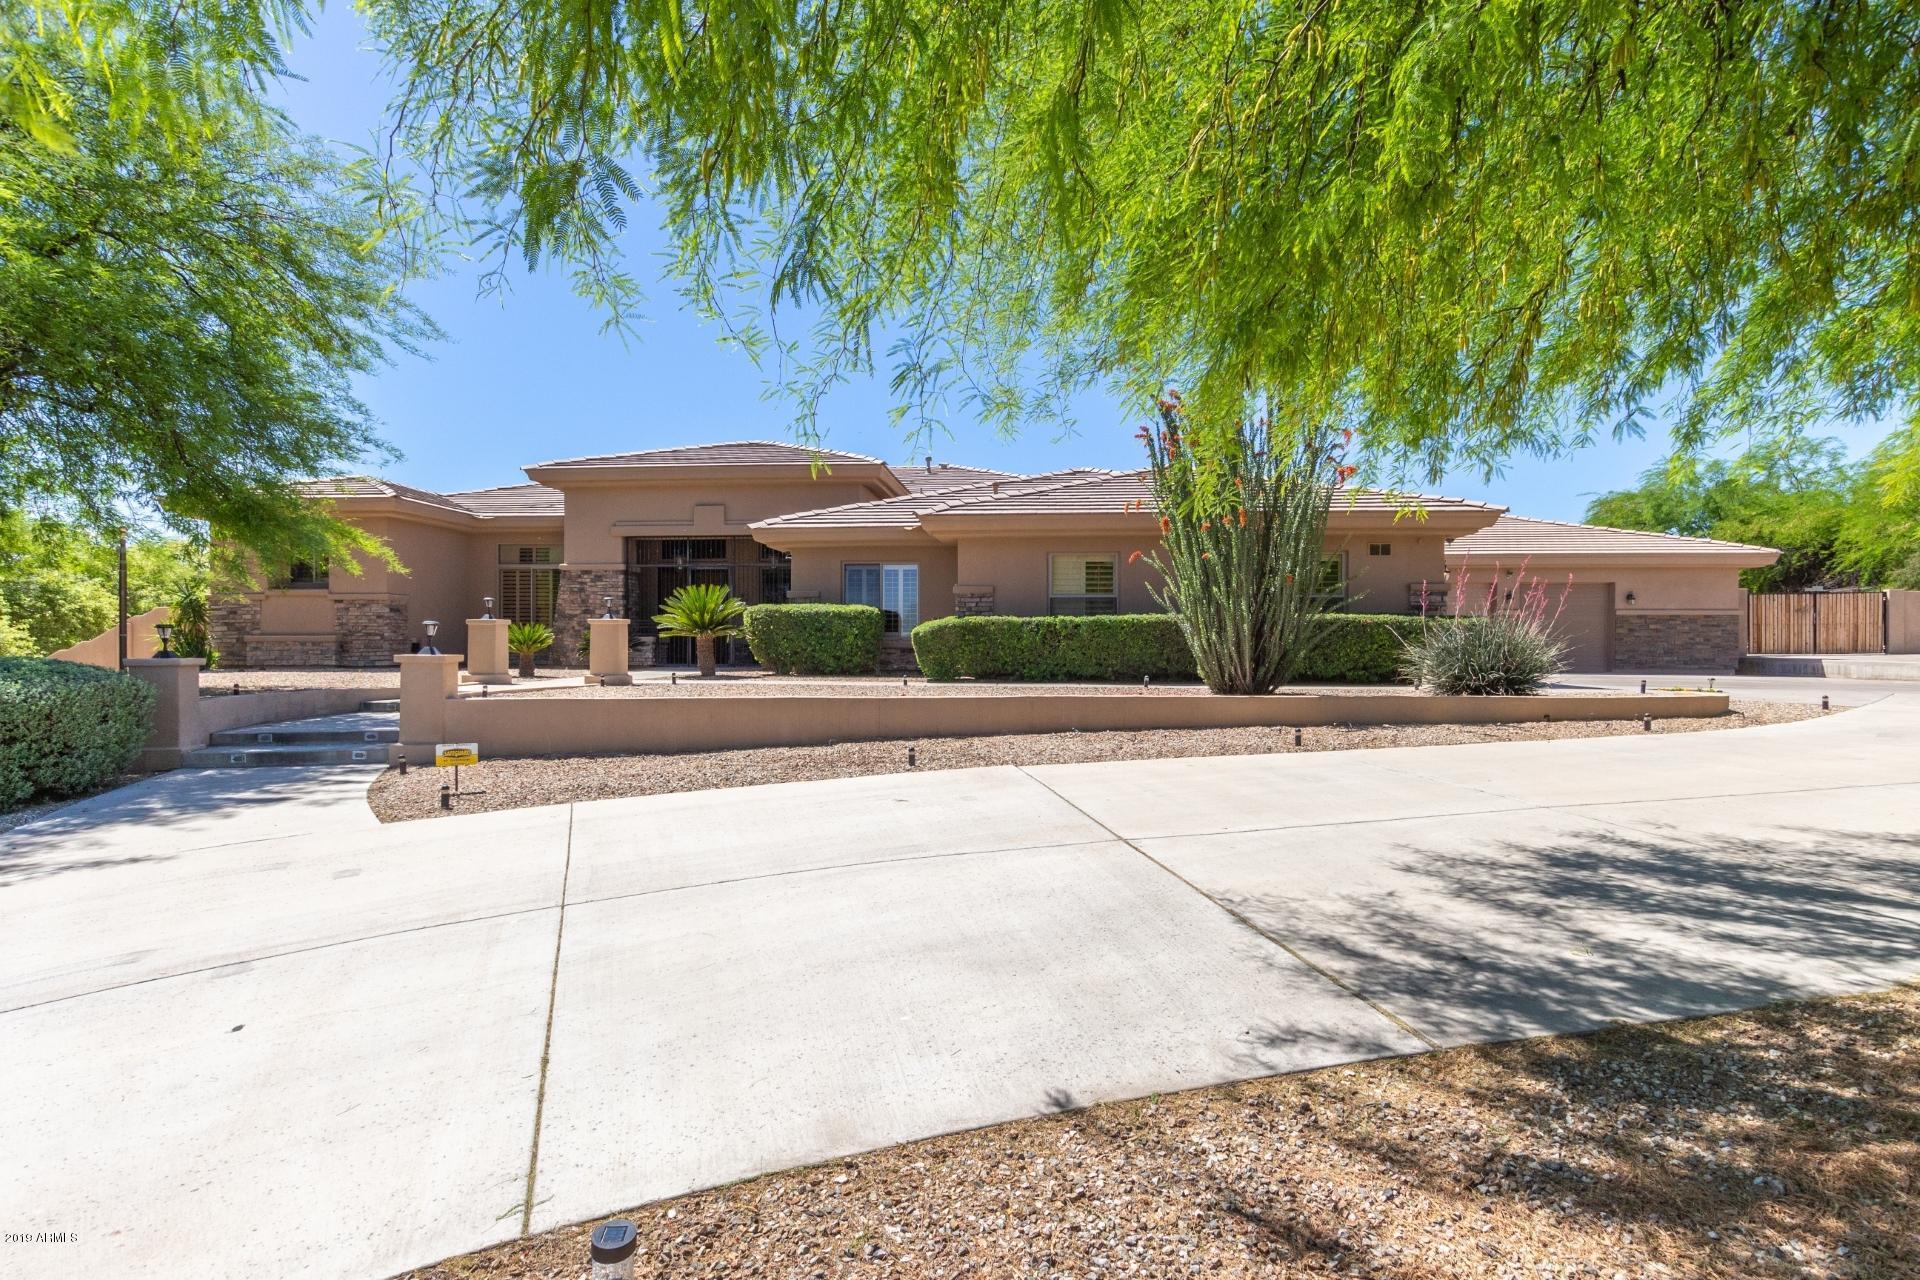 Photo of 12721 W SOLANO Drive, Litchfield Park, AZ 85340